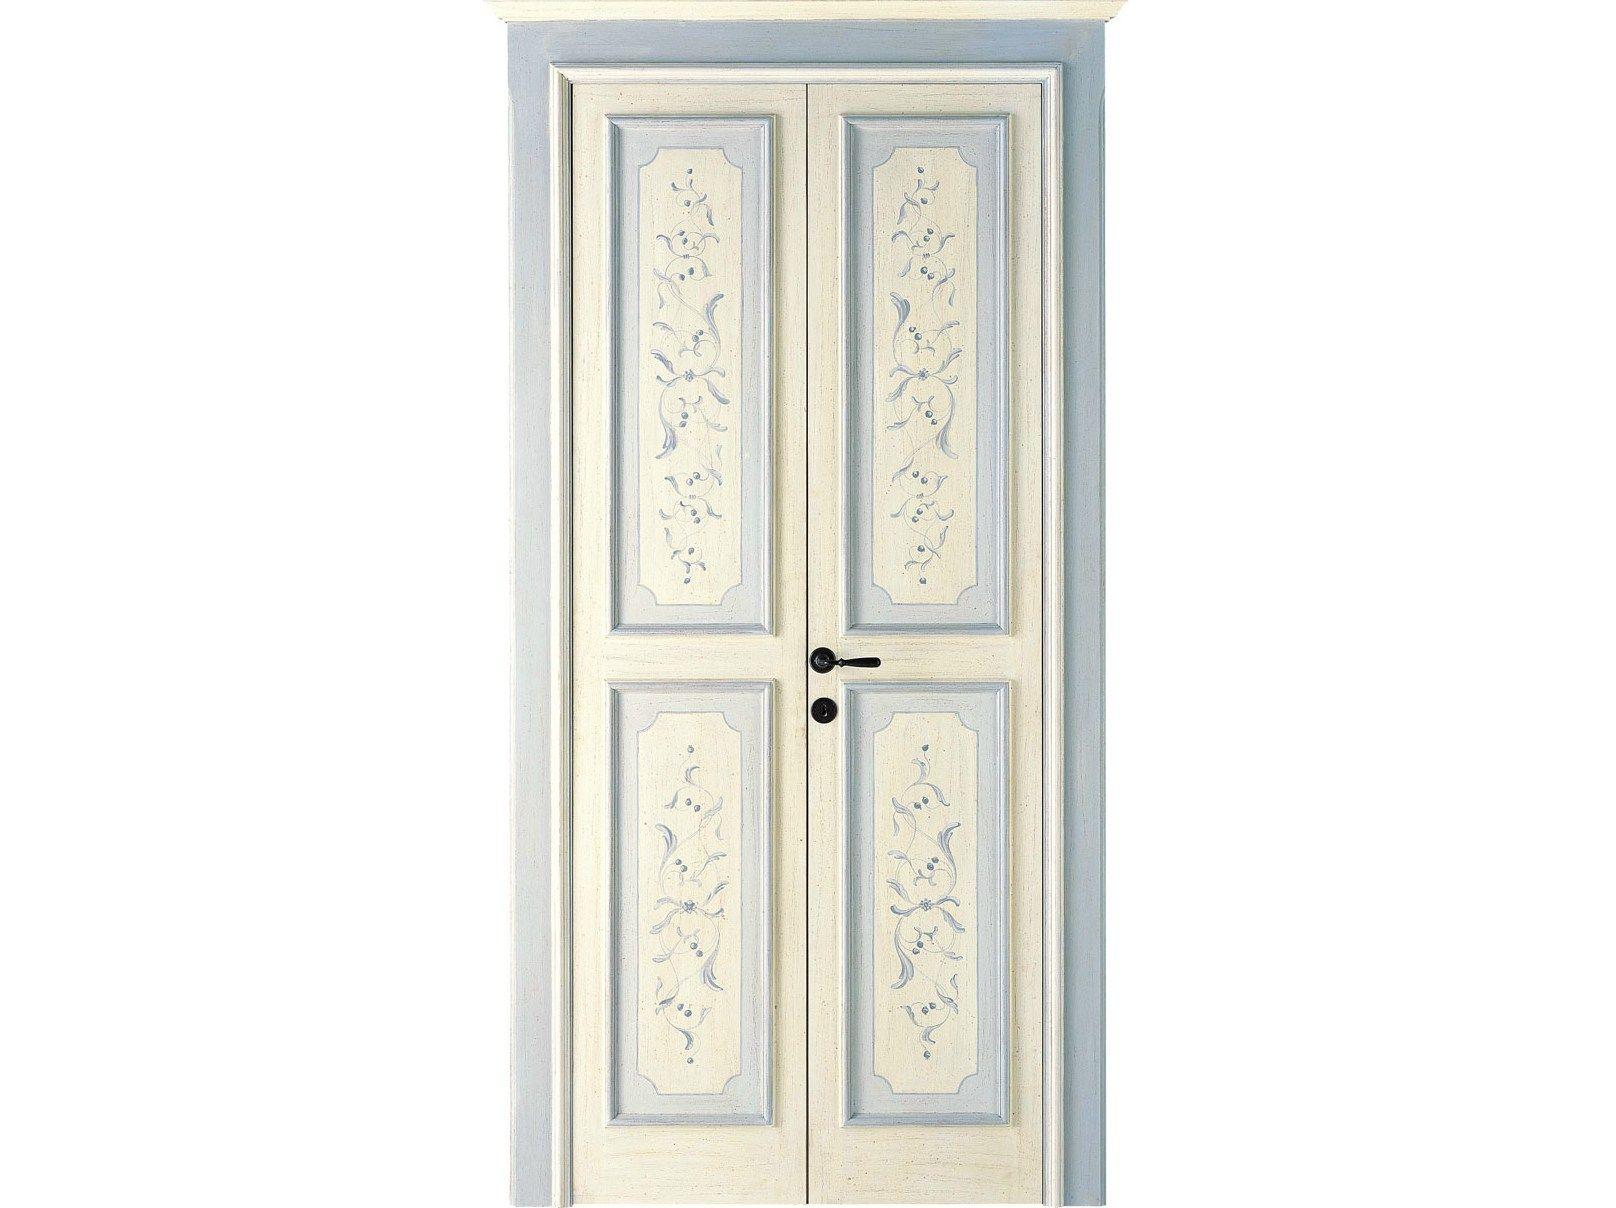 Wooden door LUNAMARE - ANTICHE PORTE - DI.BI. PORTE BLINDATE ...